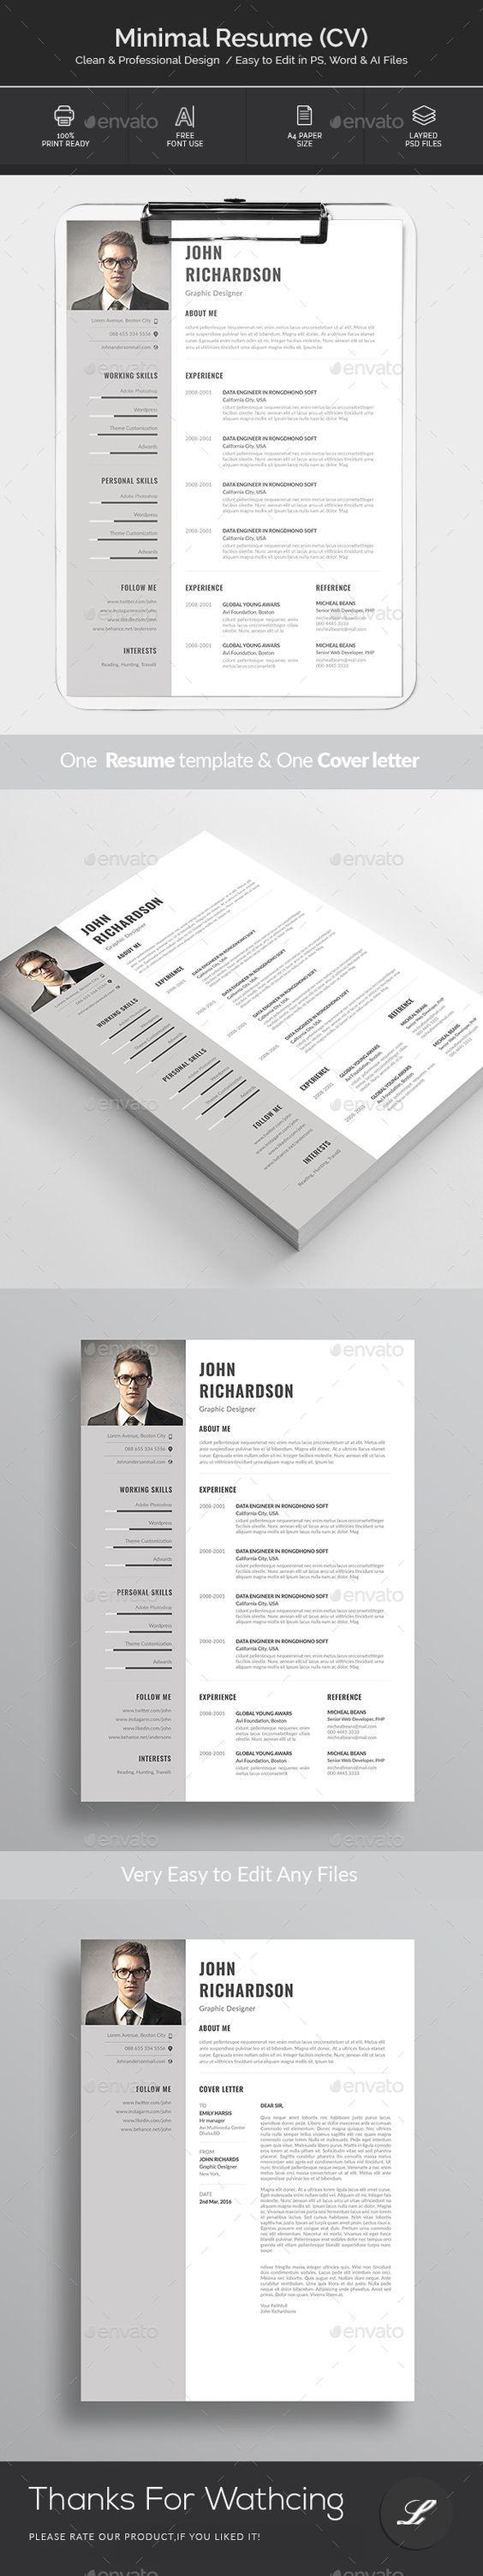 Land your dream job using Canva's online resume builder